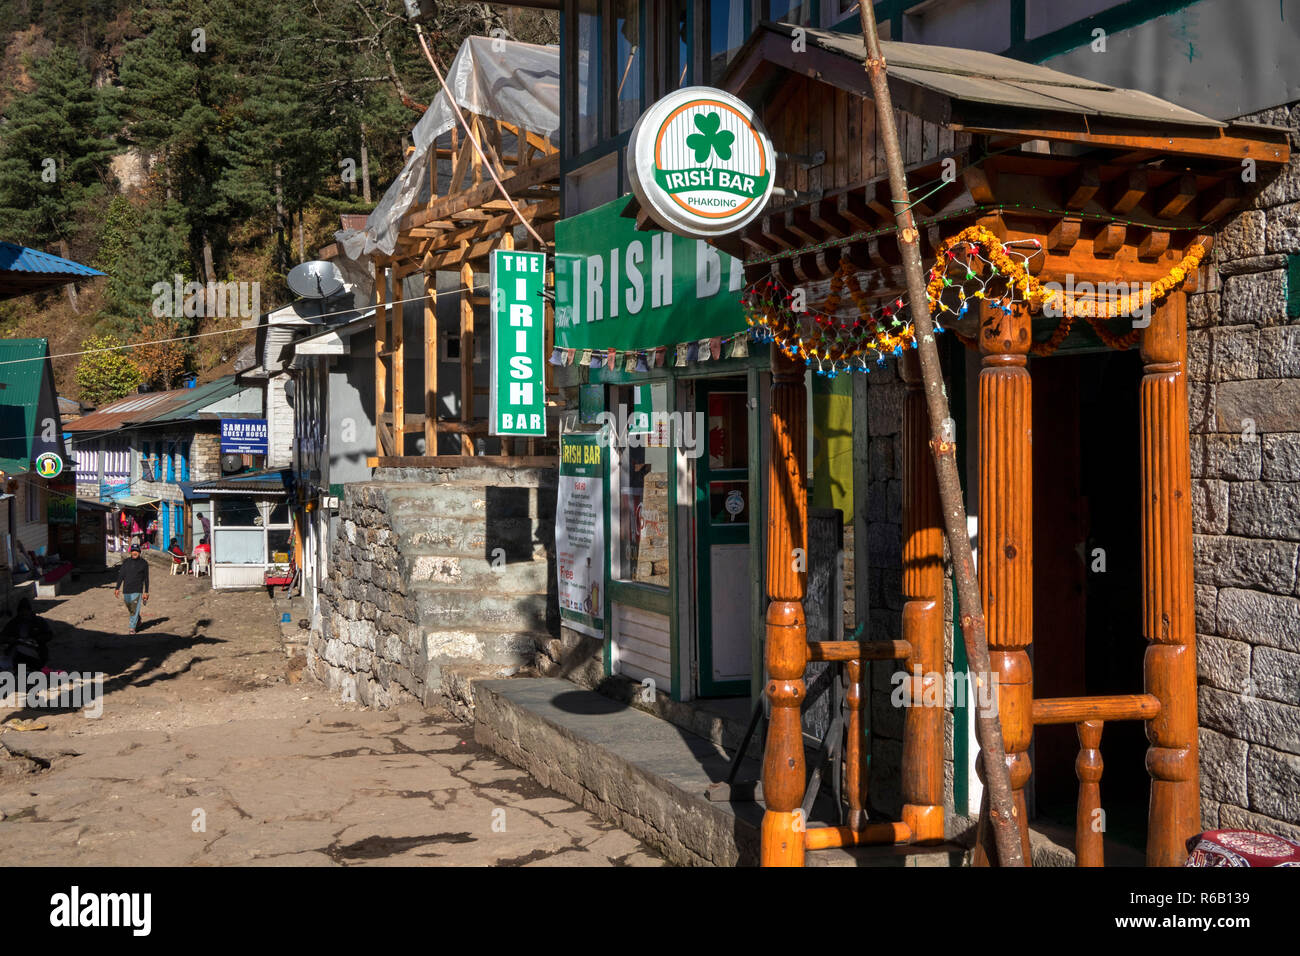 Nepal, Phakding, The Irish Bar, themed bar aimed at trekkers beside Everest Base Camp Trek path - Stock Image